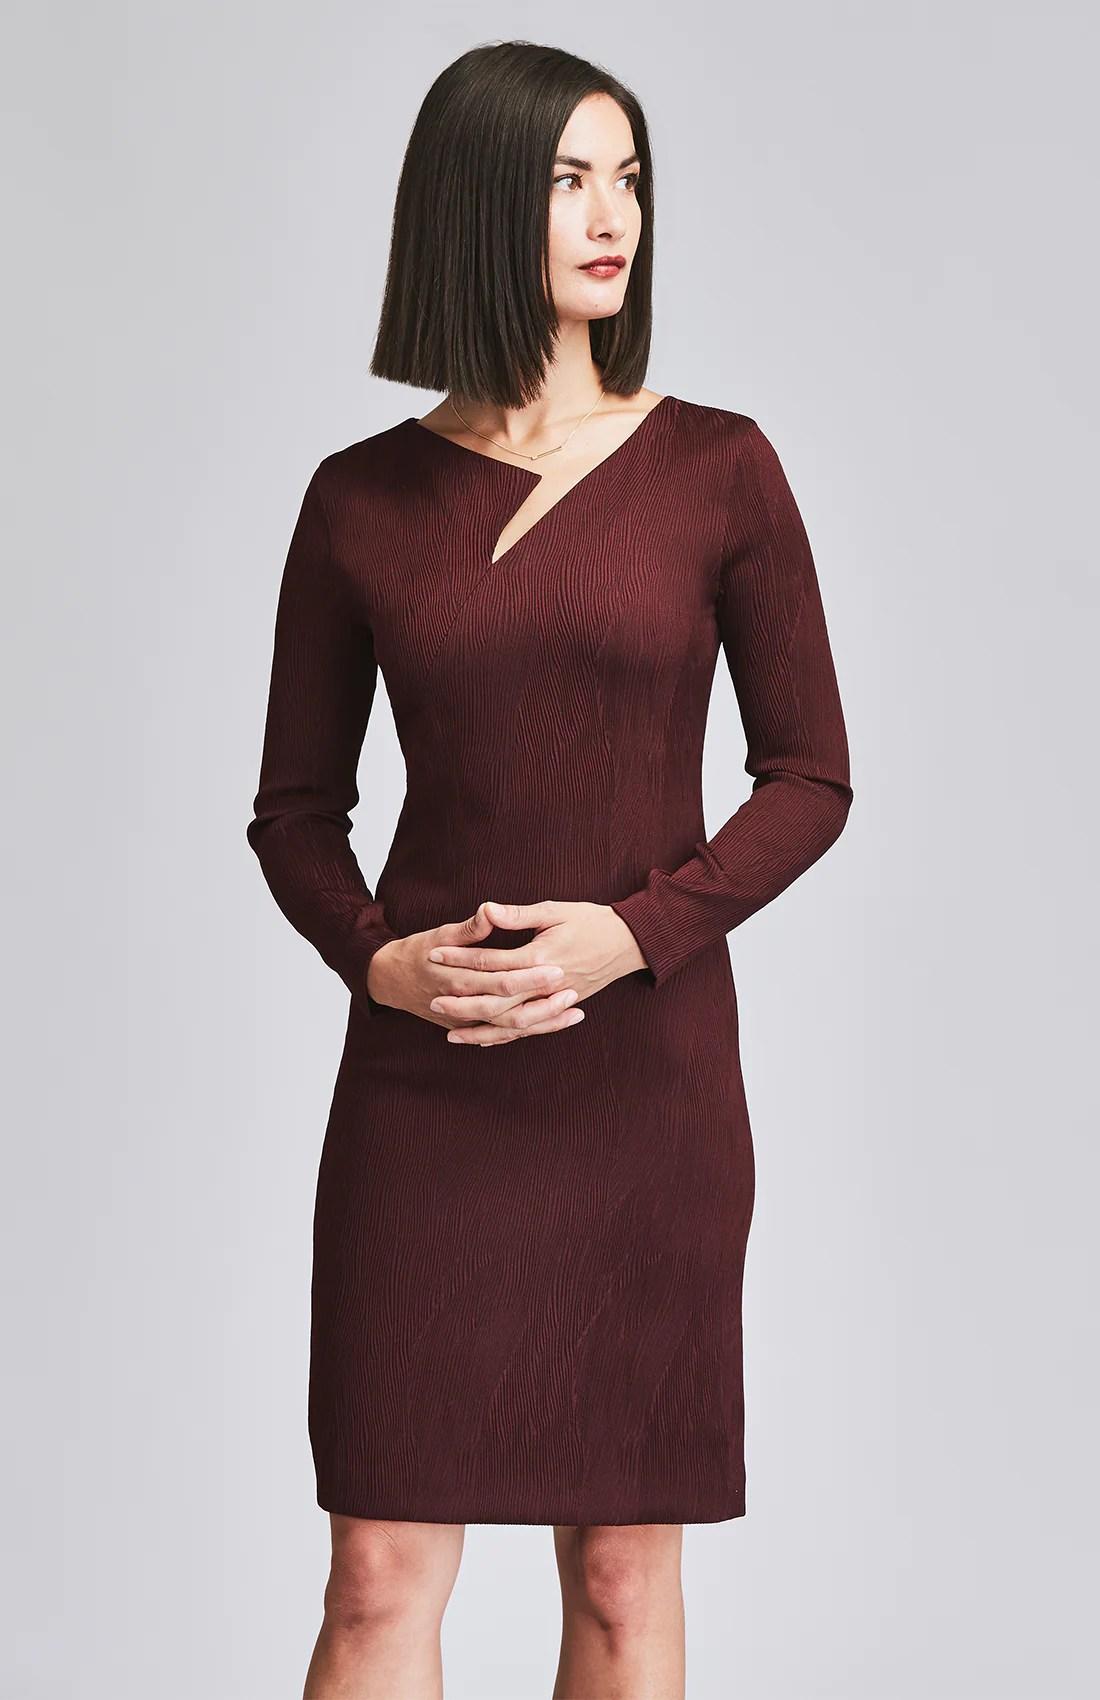 Assiduous Desk-dinner Dress Burgundy Rose & Willard